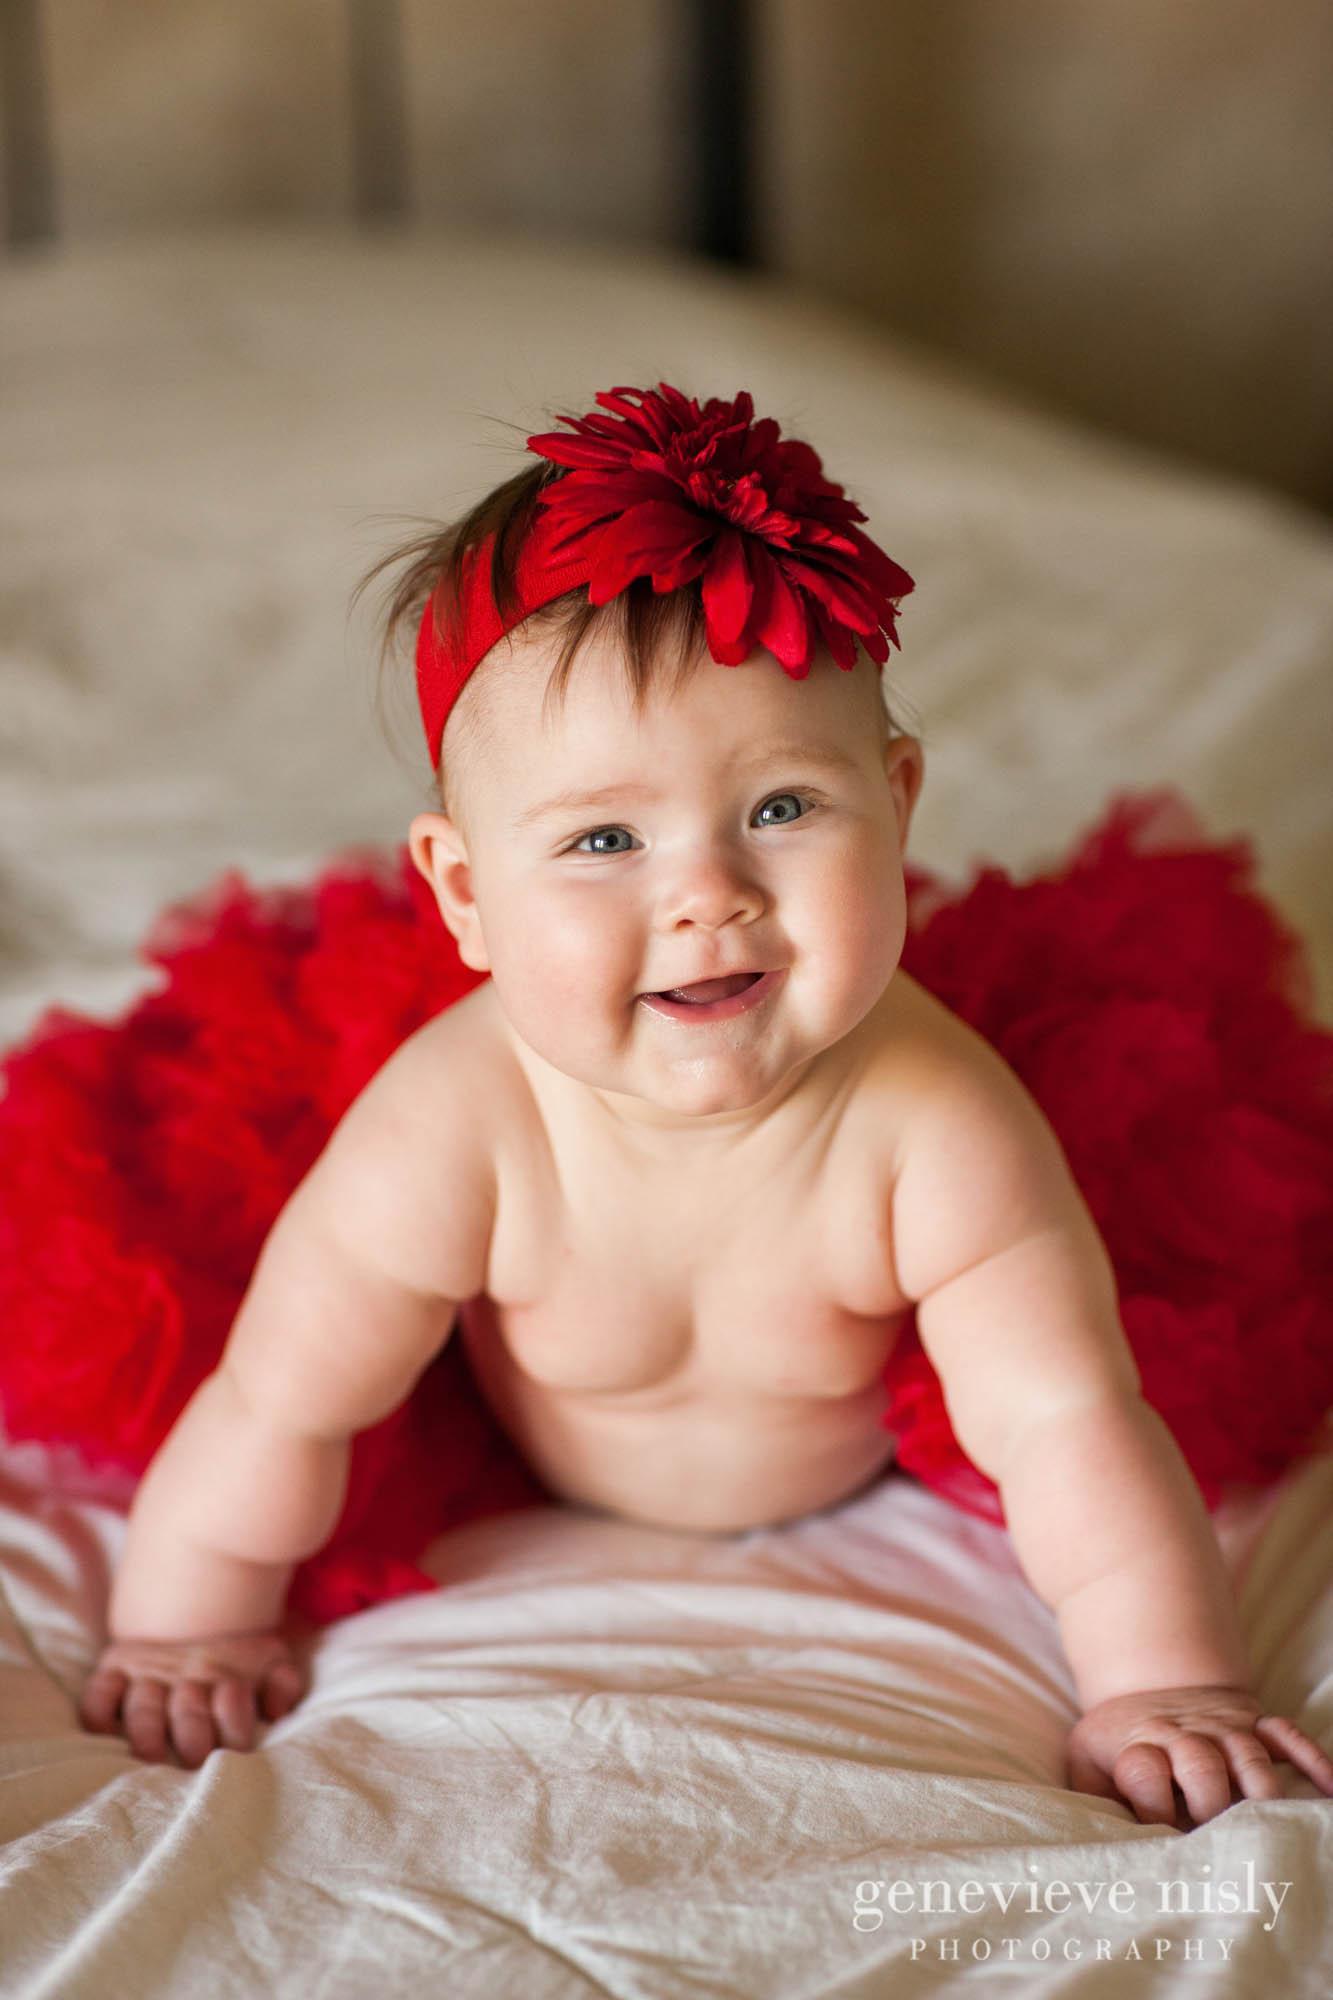 Baby, Copyright Genevieve Nisly Photography, Green, Ohio, Portraits